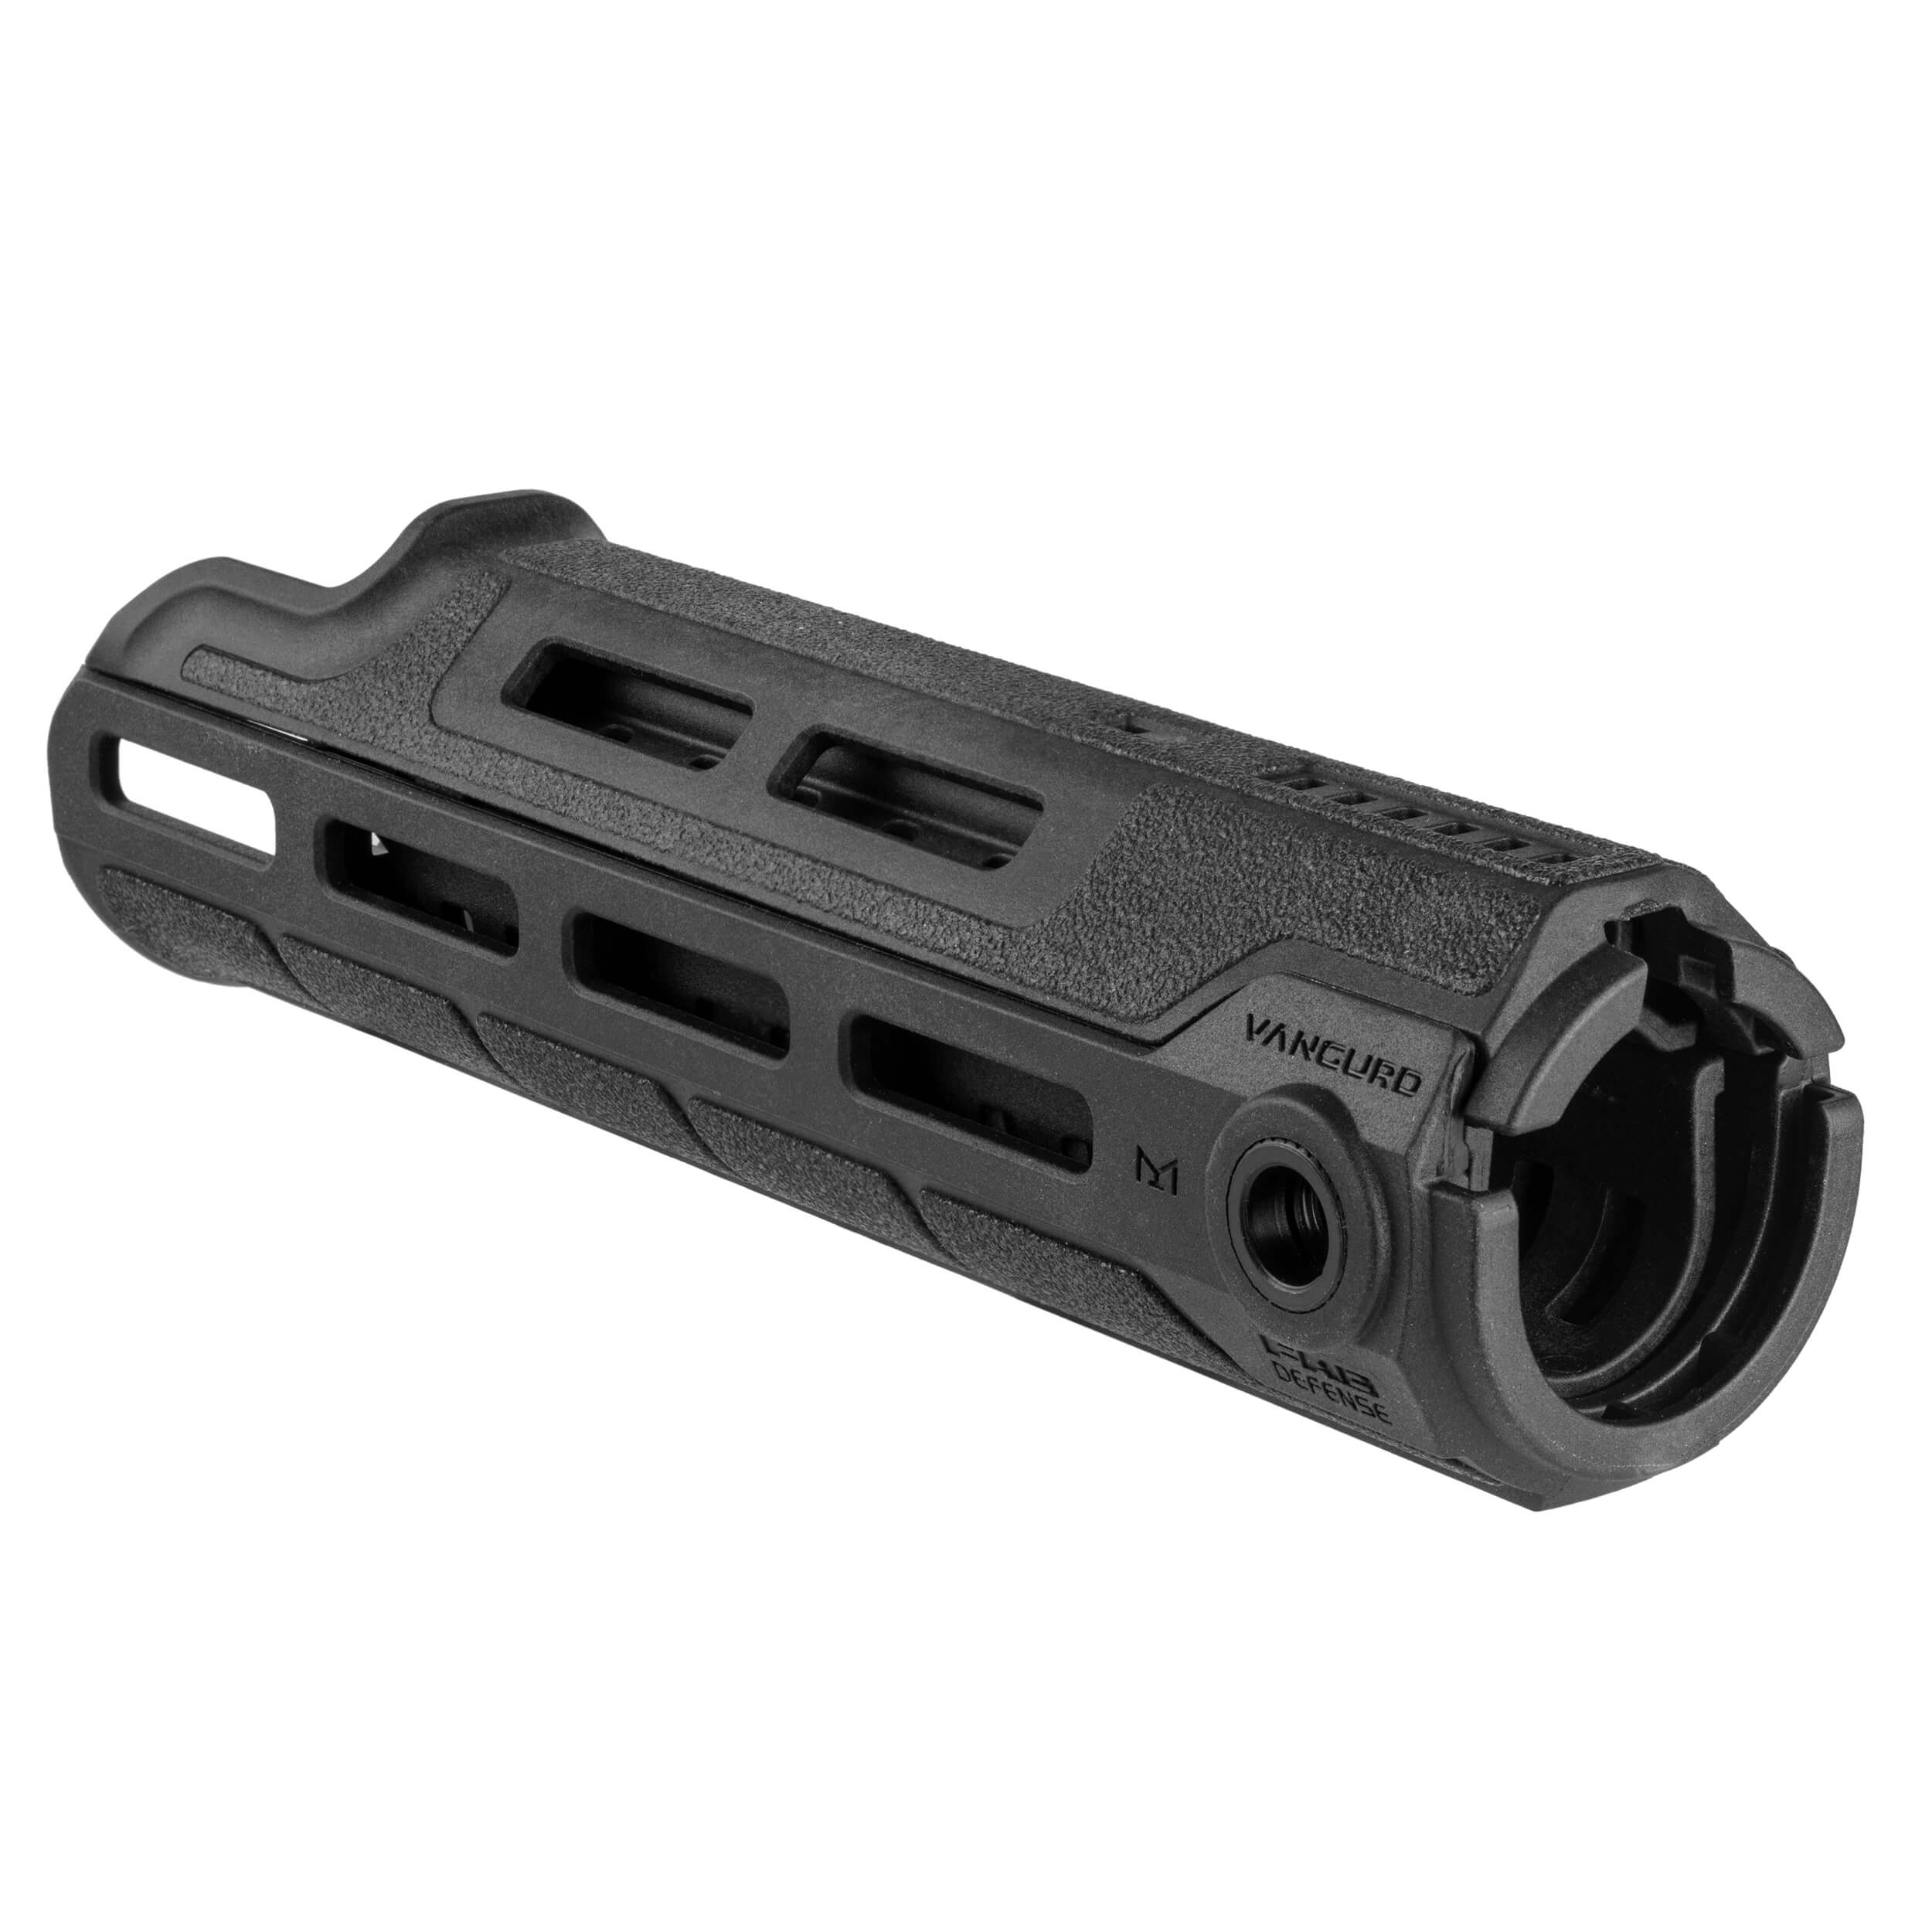 Vanguard AR M-LOK compatible Handguard for AR Platforms